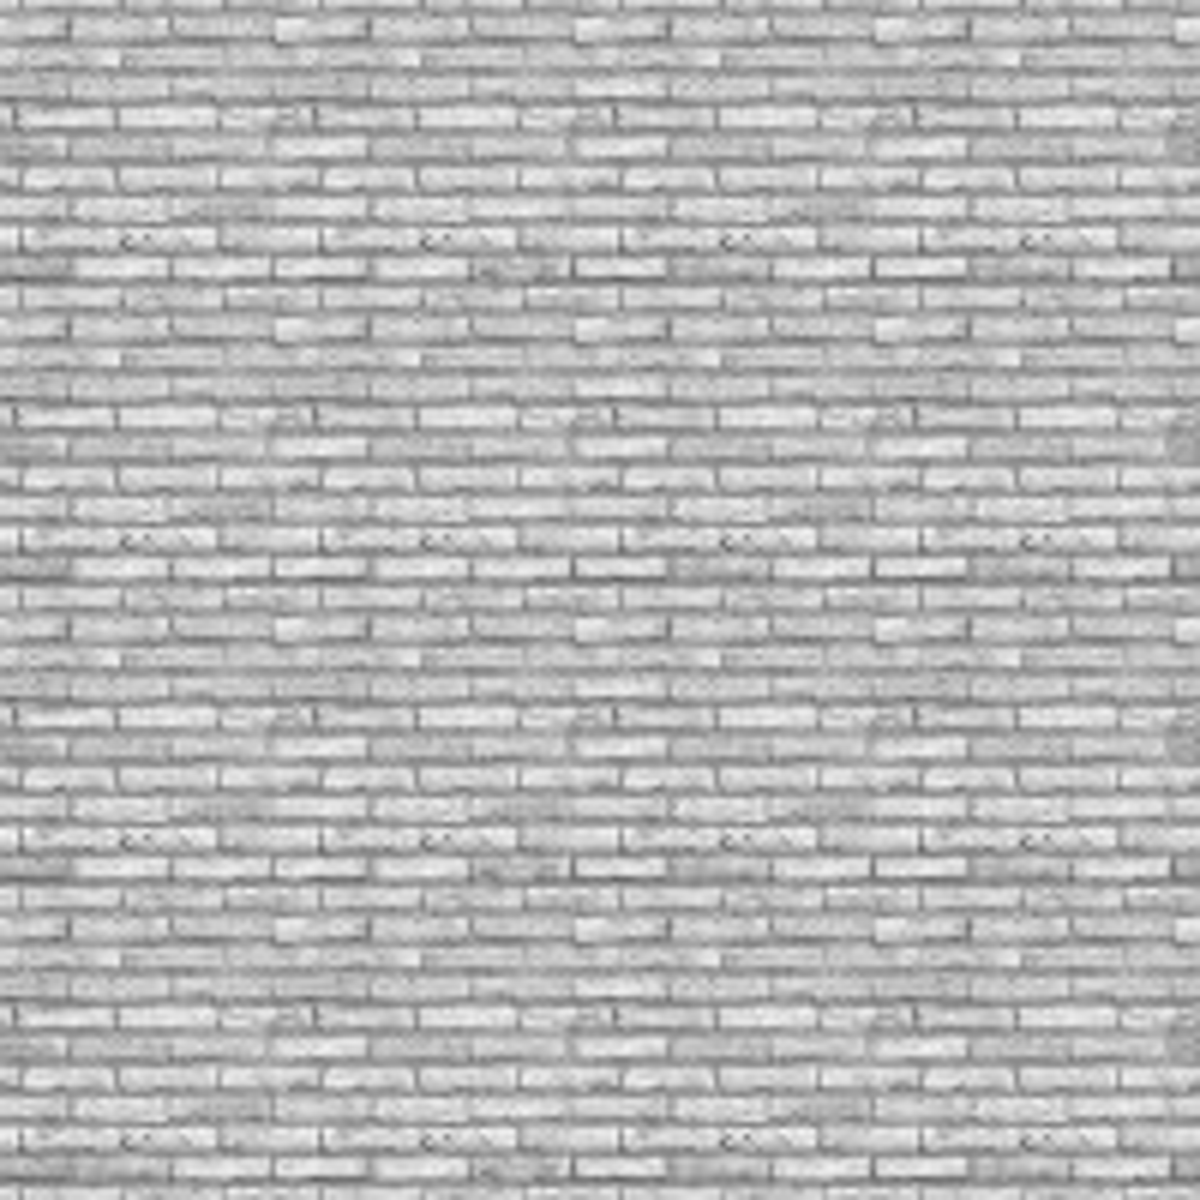 Light Old Brick Wallpaper Mural